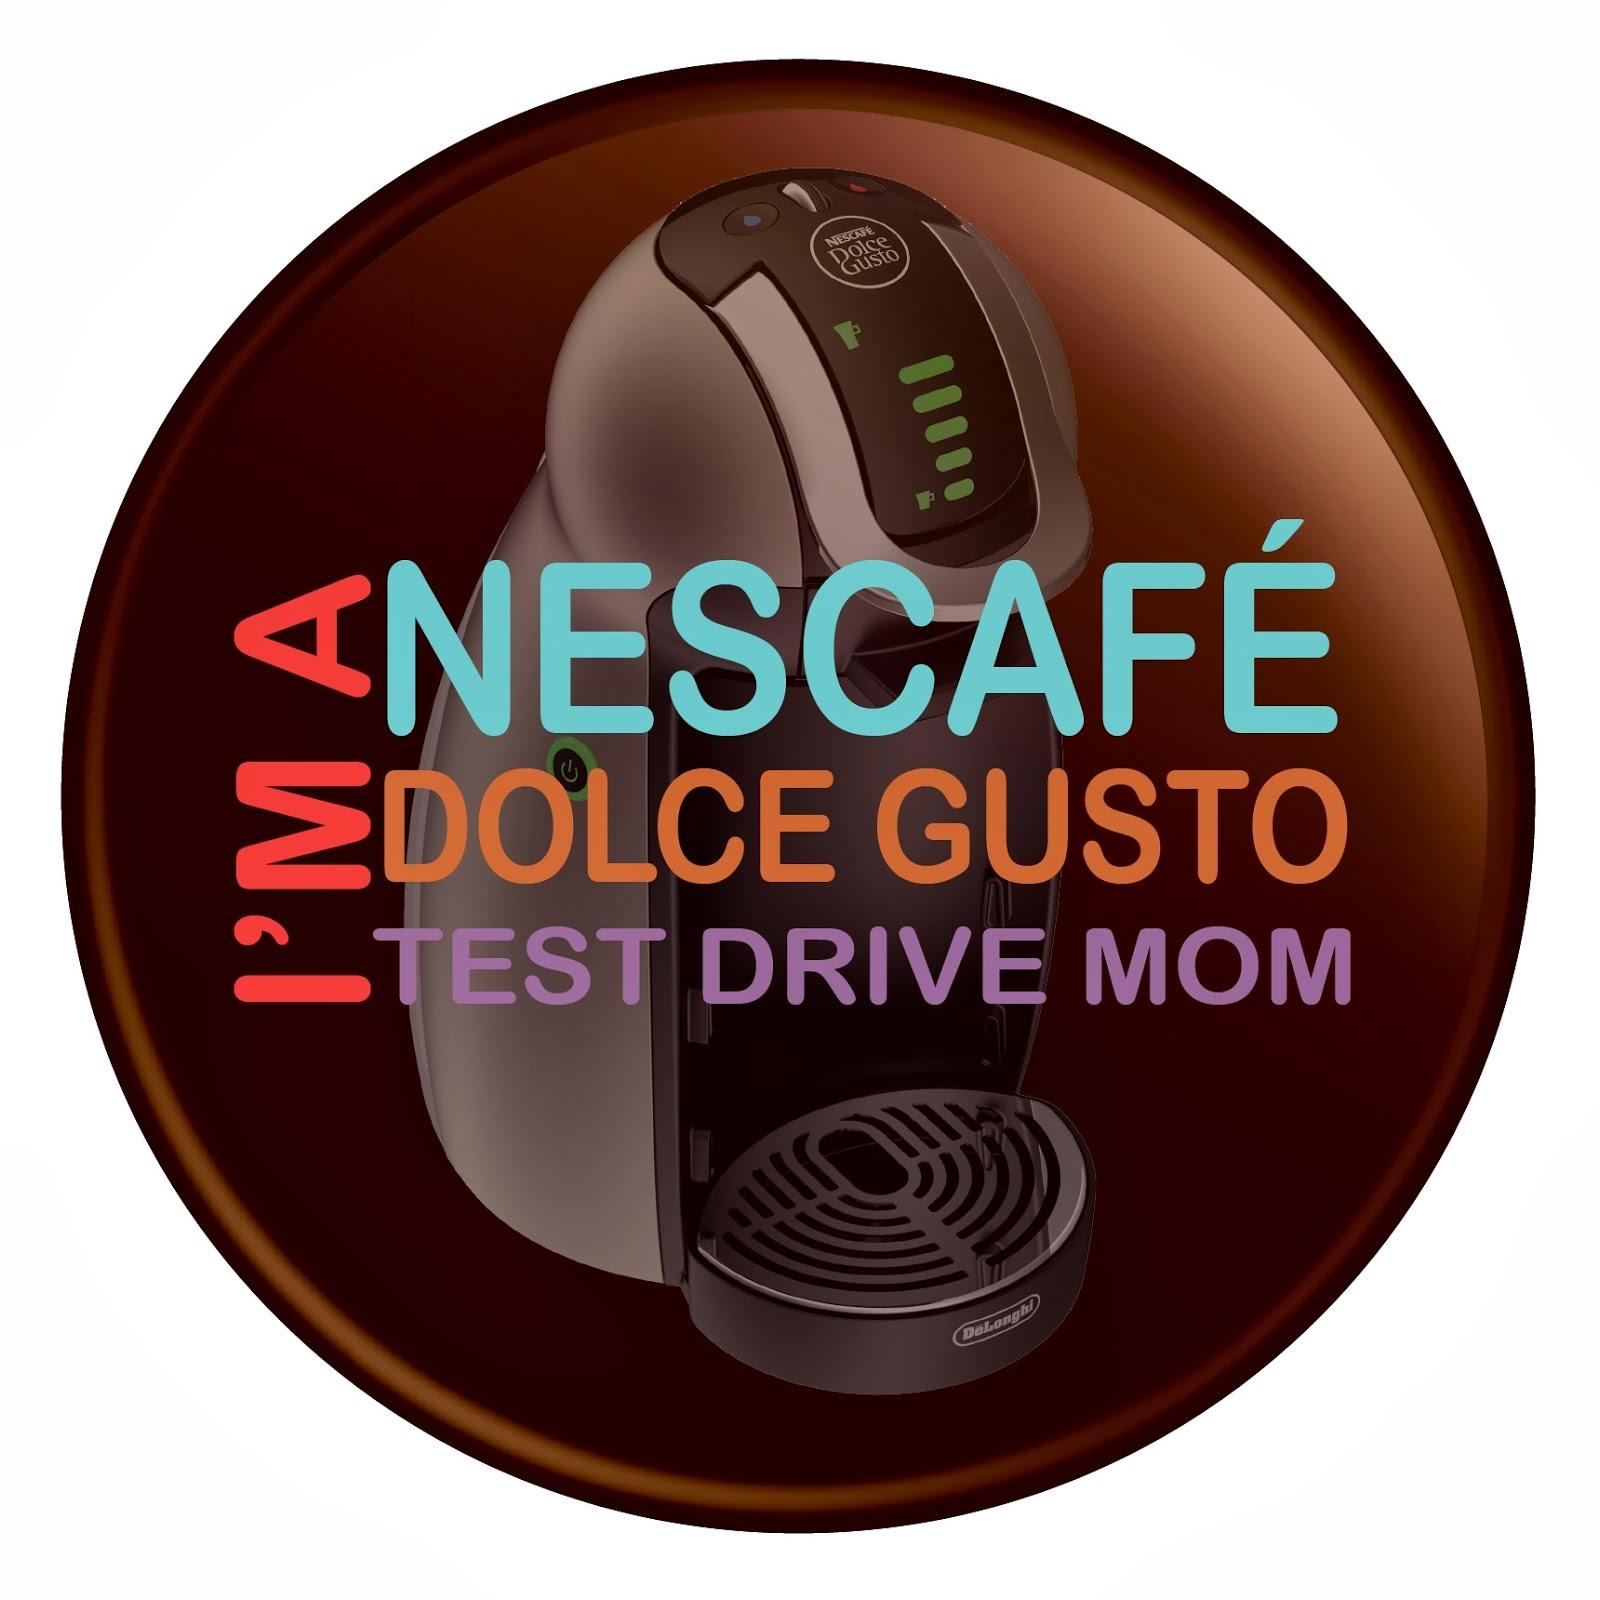 Nescafe Dolce test drive mom